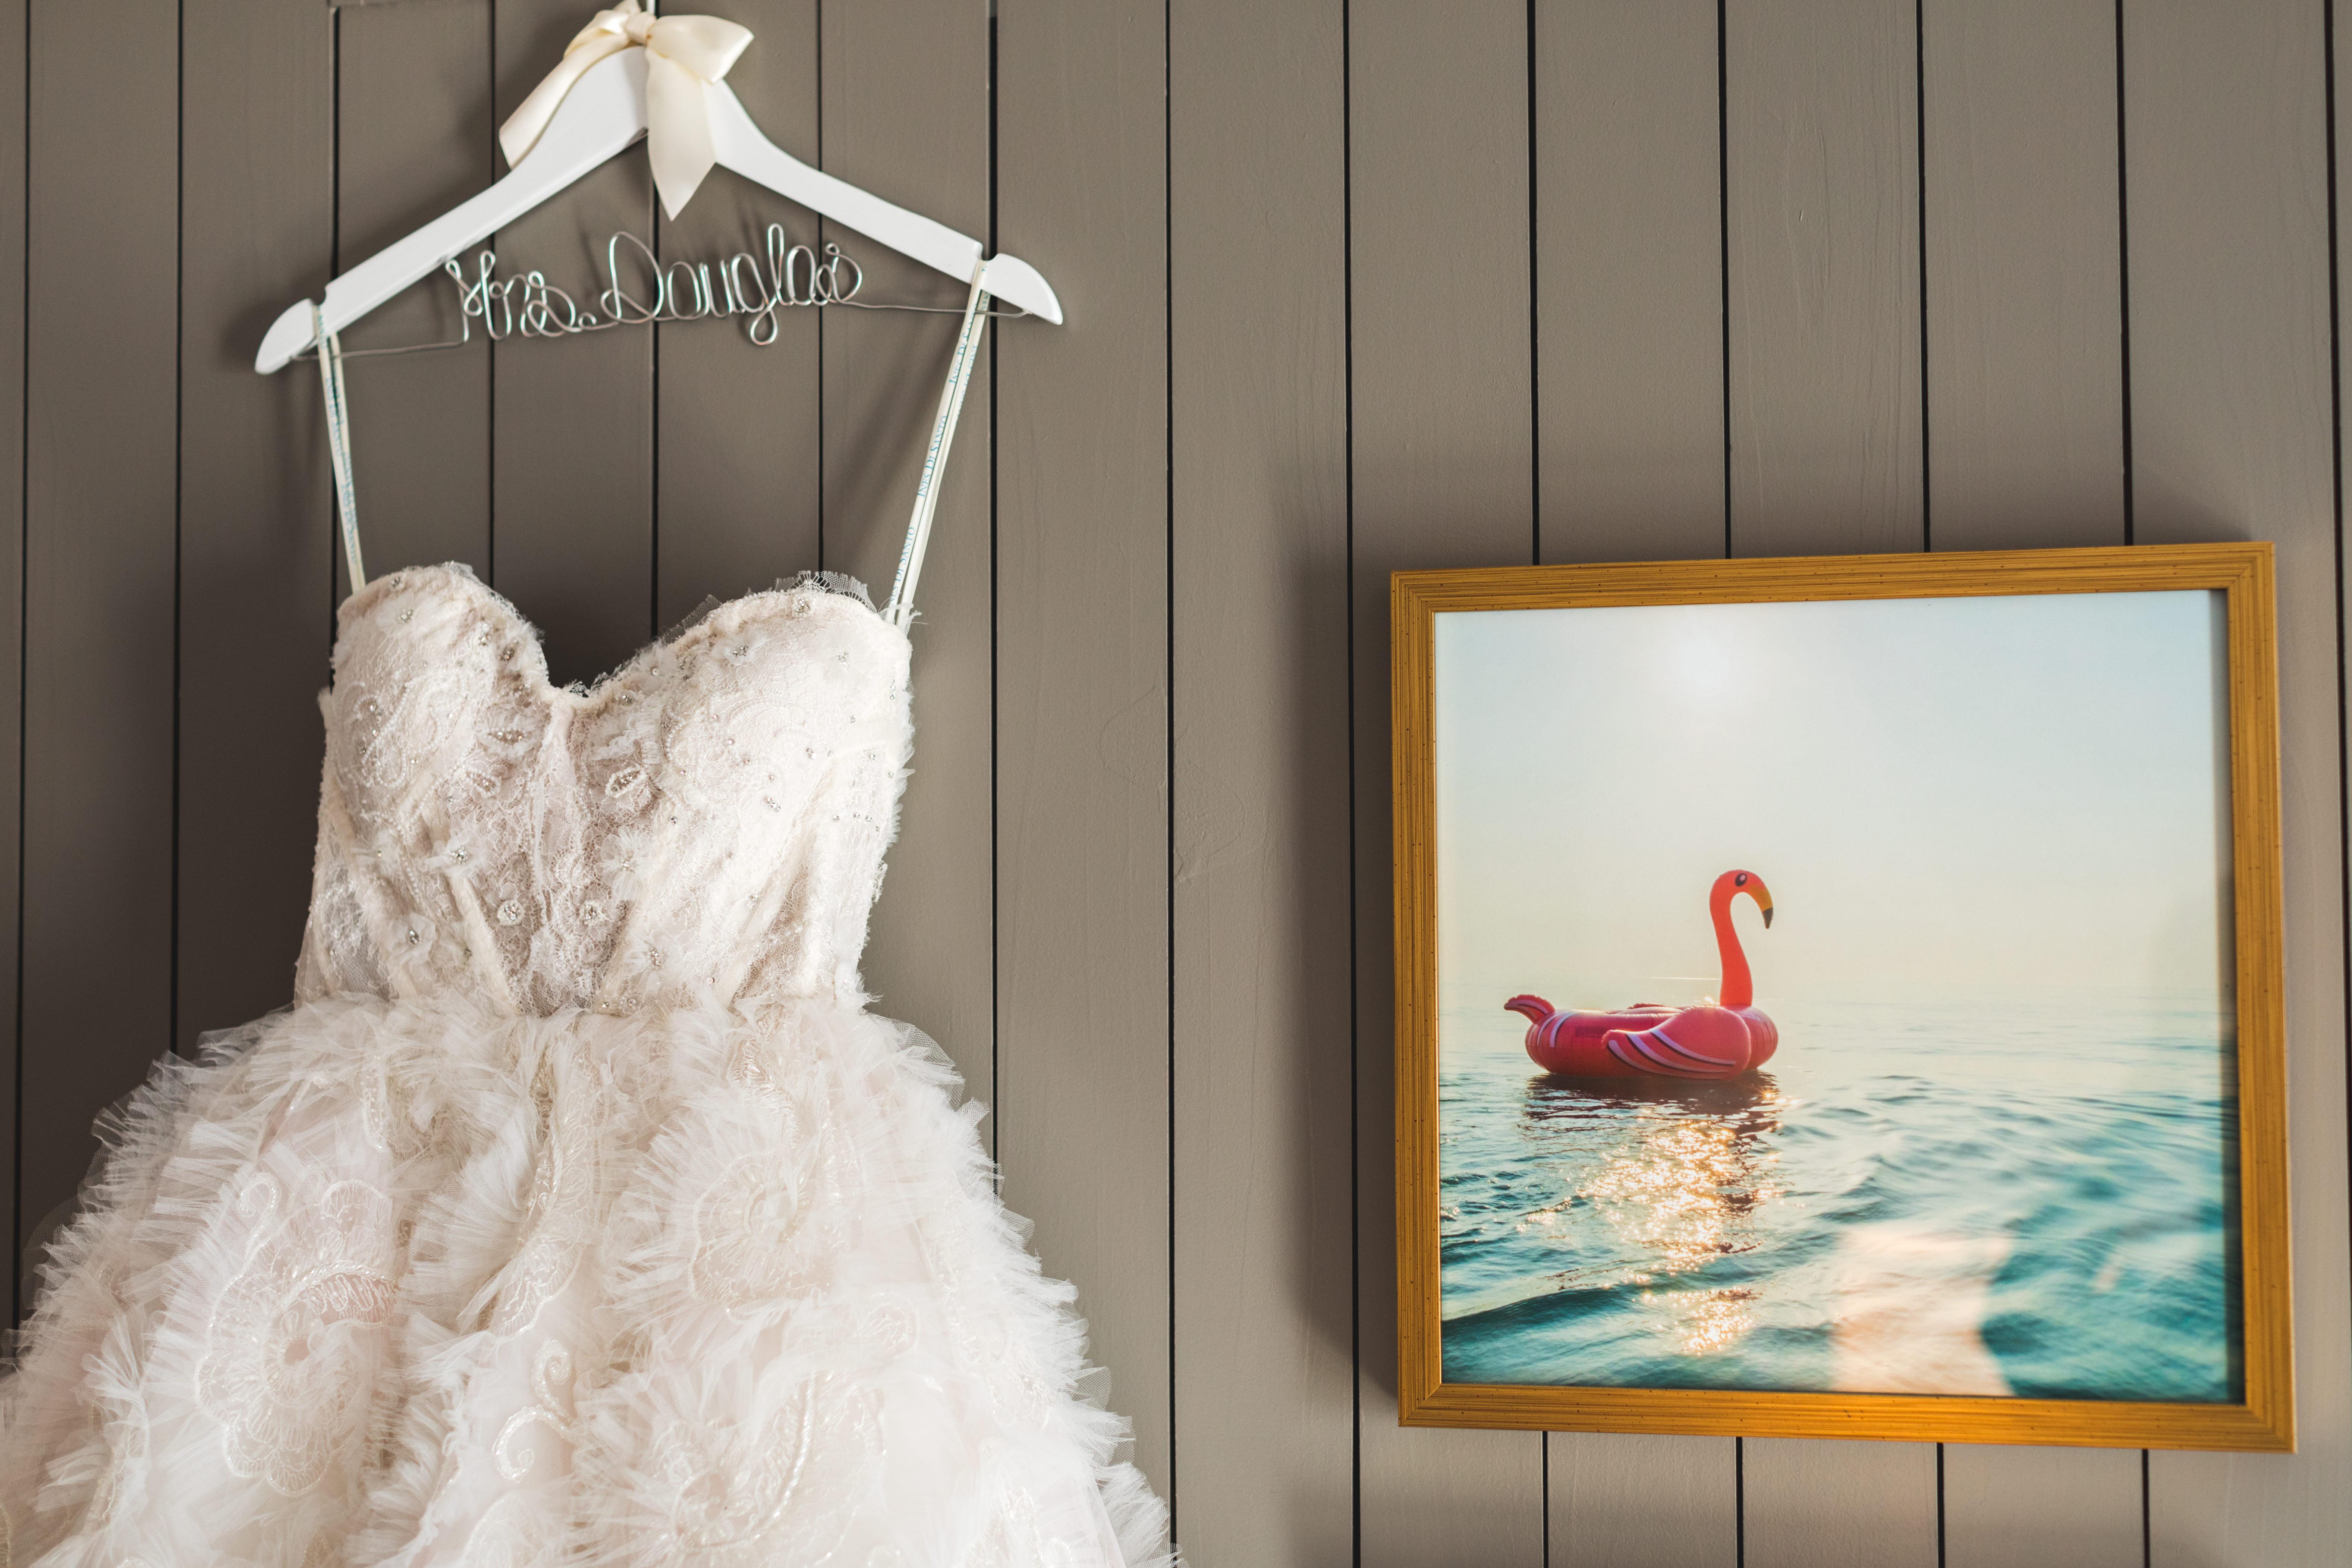 INSTAGRAM Ines Di Santo Modern Sweetheart Strapless Ruffled Skirt Wedding Dress on Custom Hanger   Tampa Bay Wedding Dress Shop Isabel O'Neil Bridal